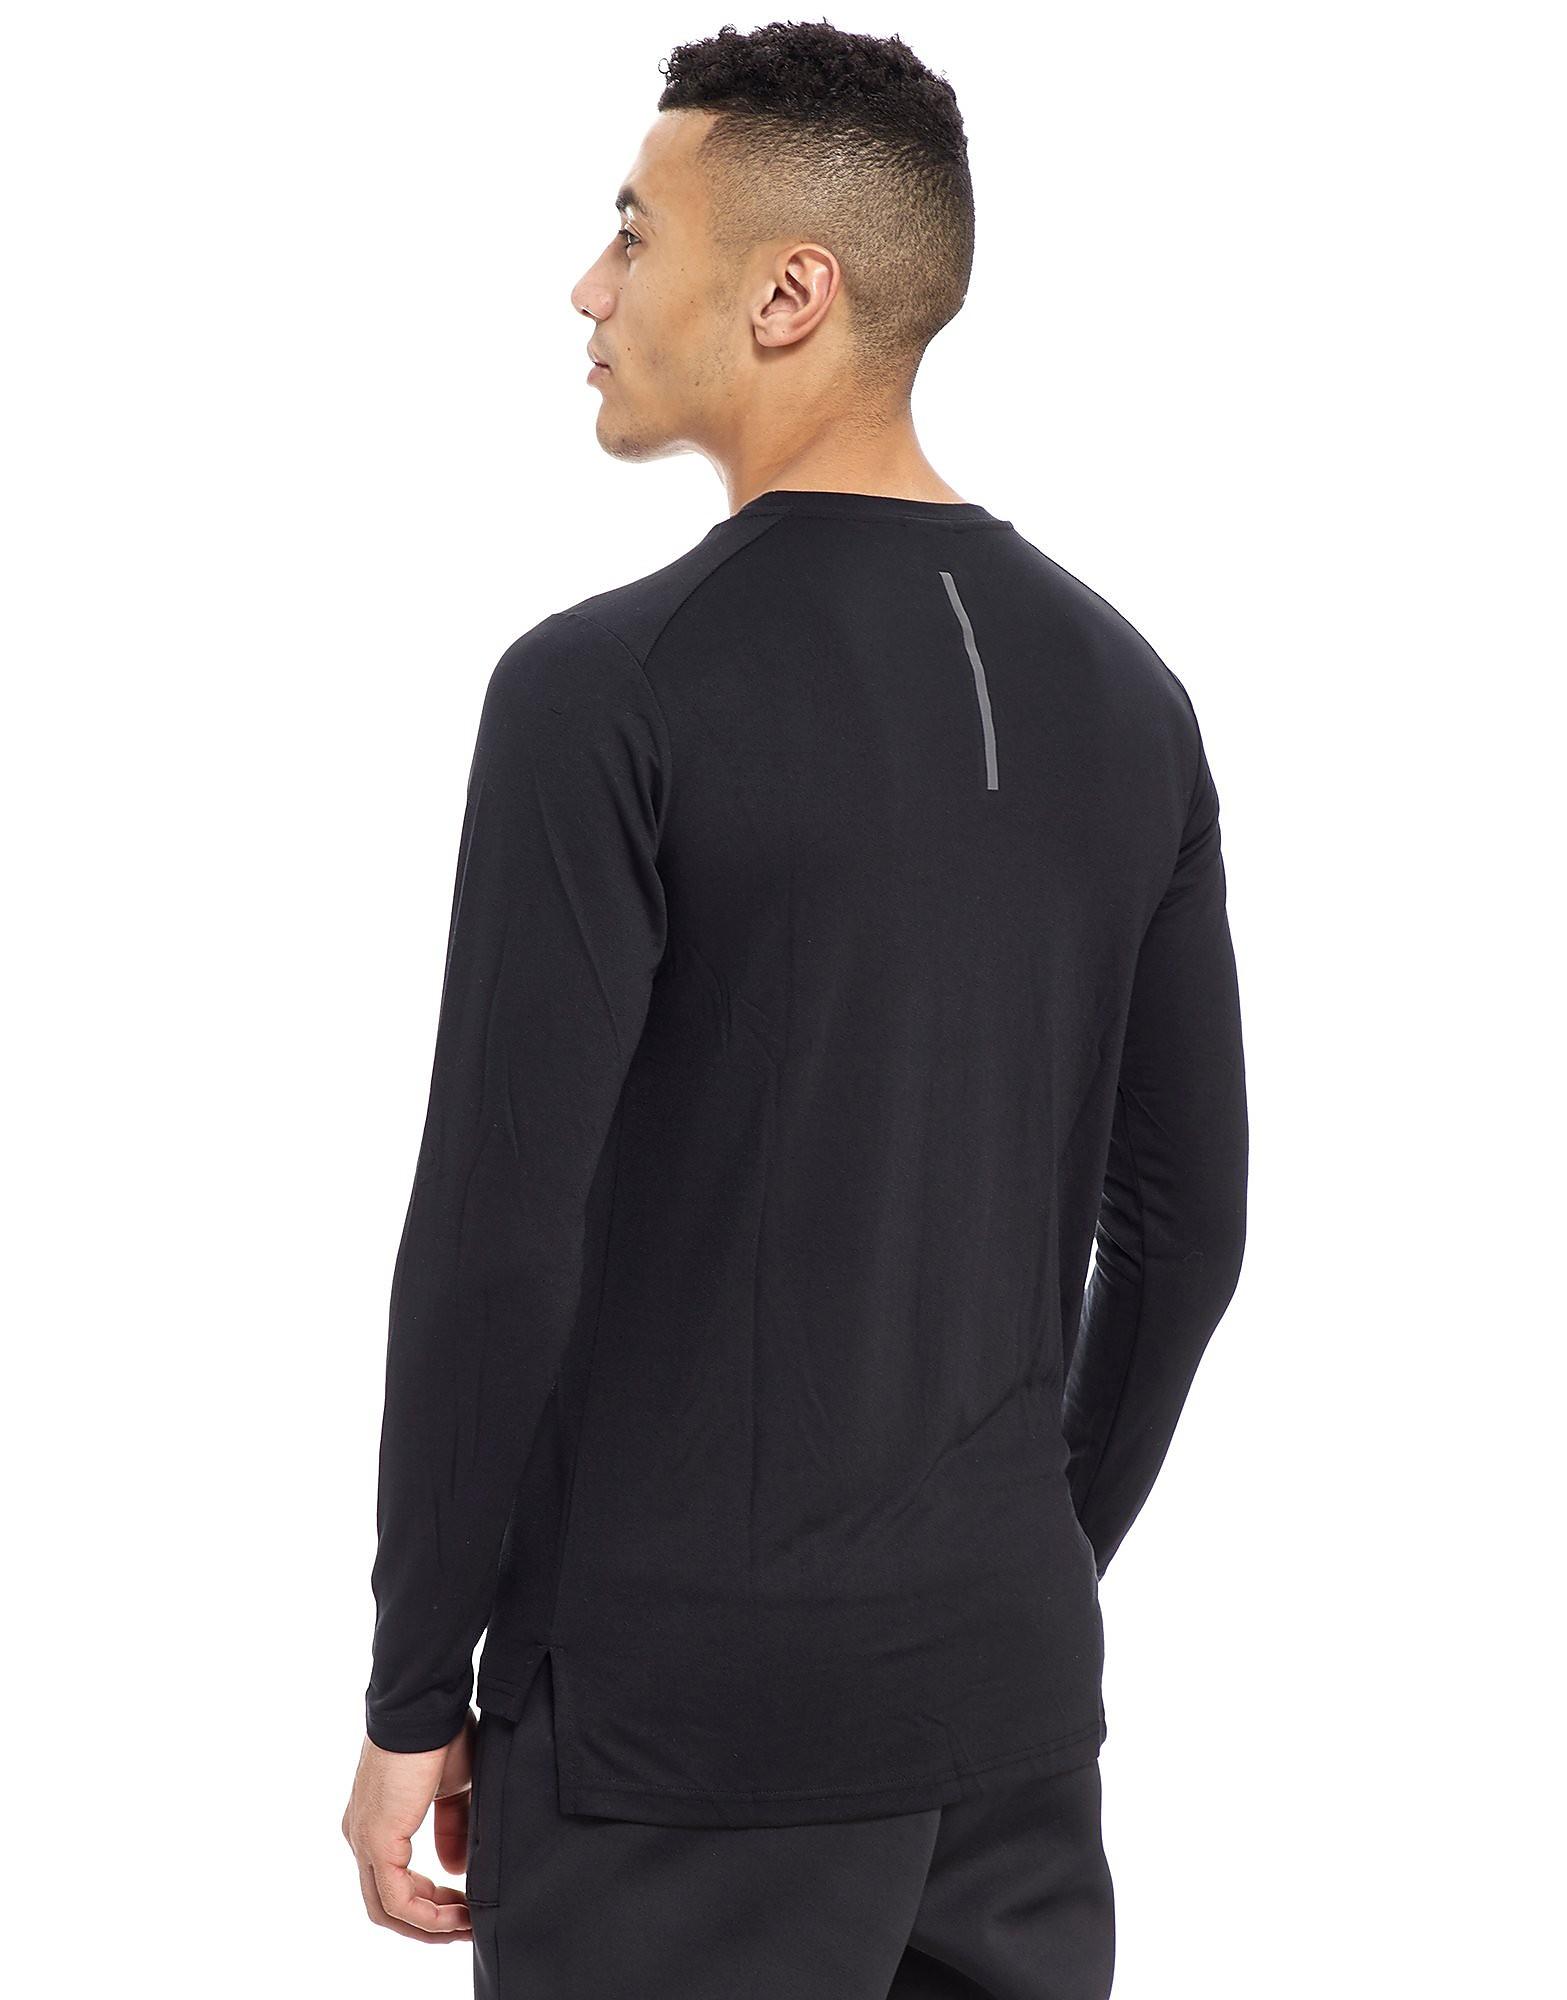 New Balance 247 Liverpool FC Langarm T-Shirt